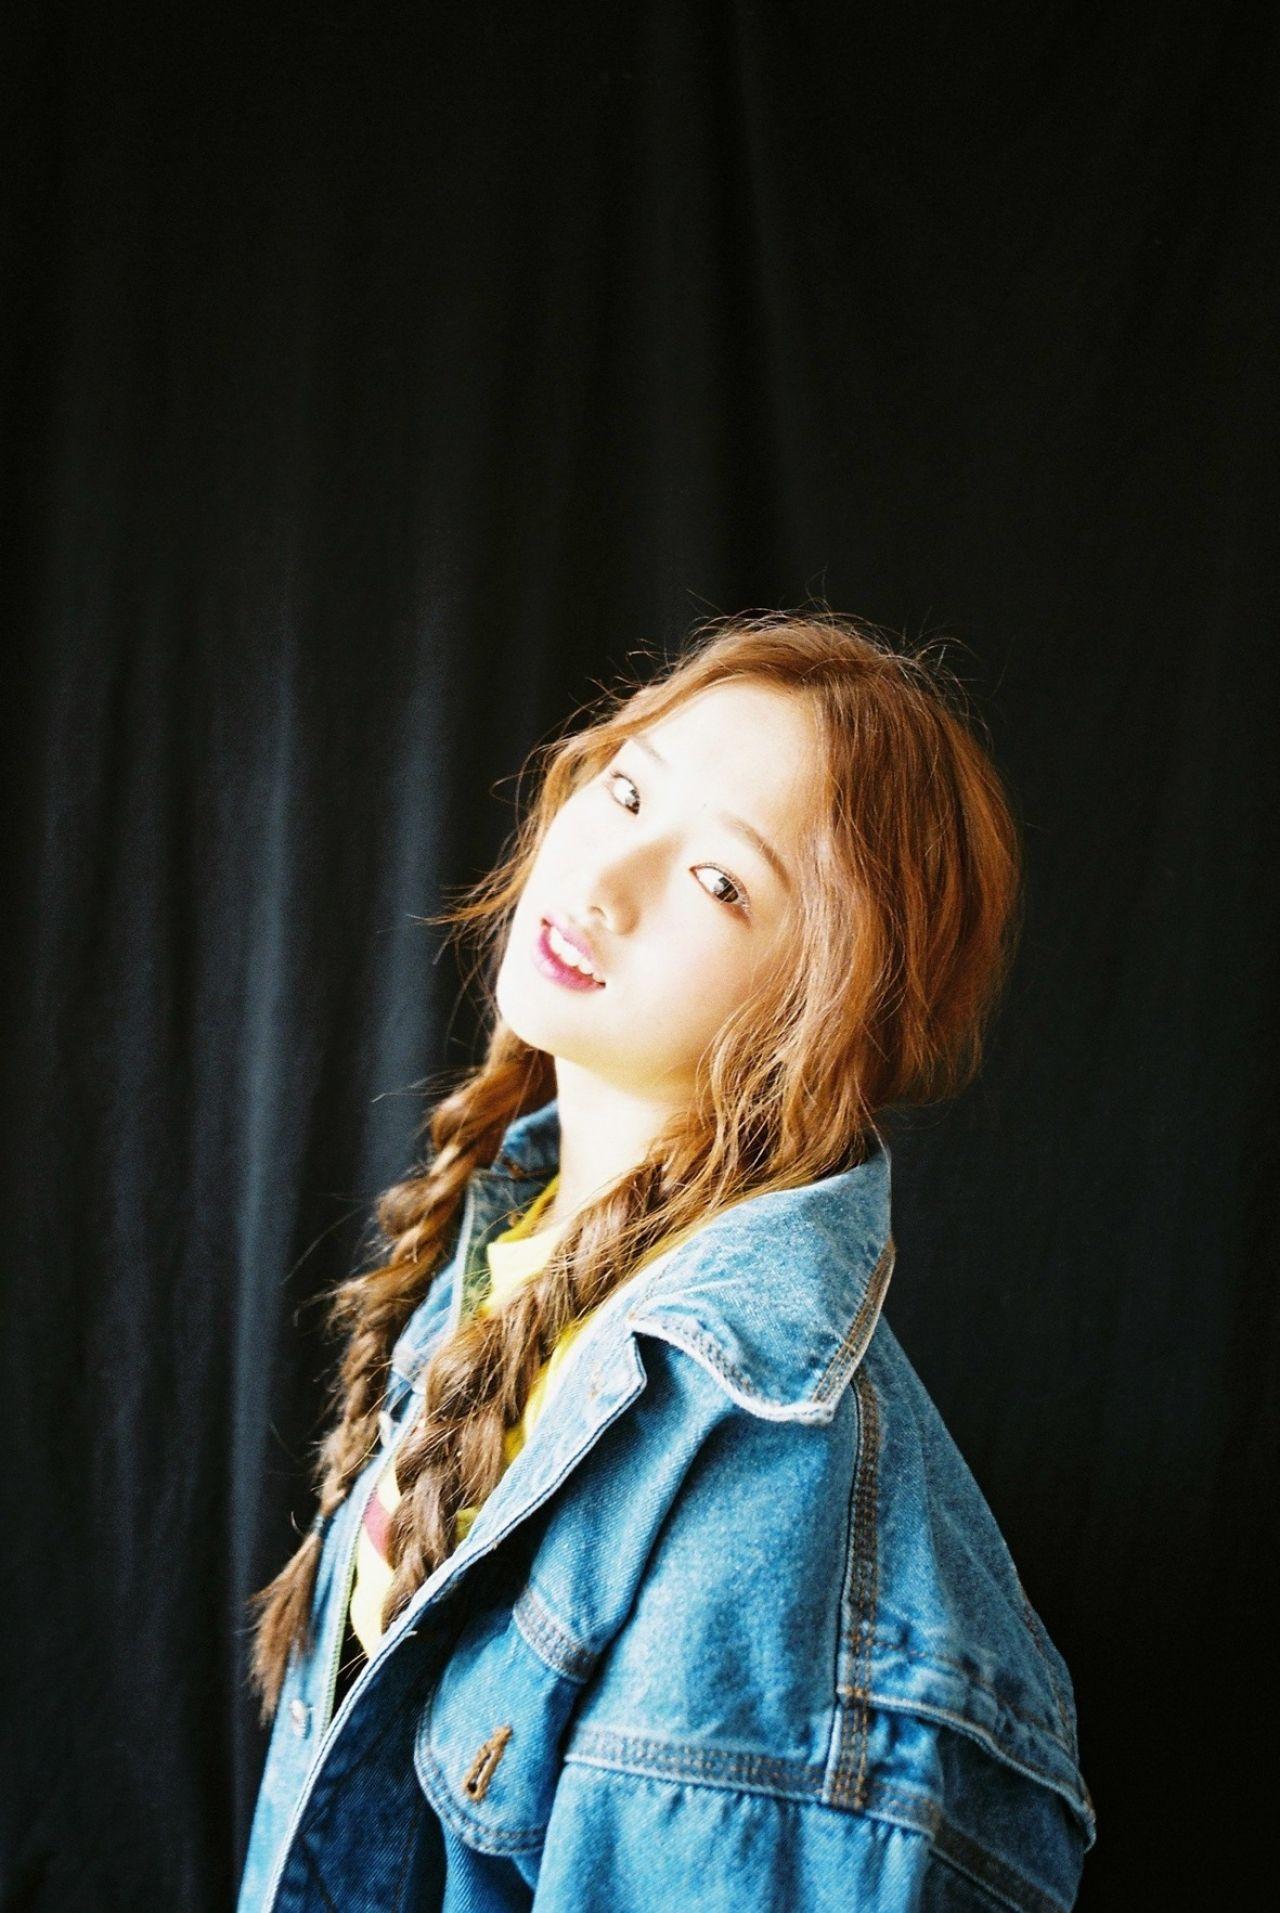 Kriesha Chu Kriesha Chu 1st Single Album 2017 Photoshoot